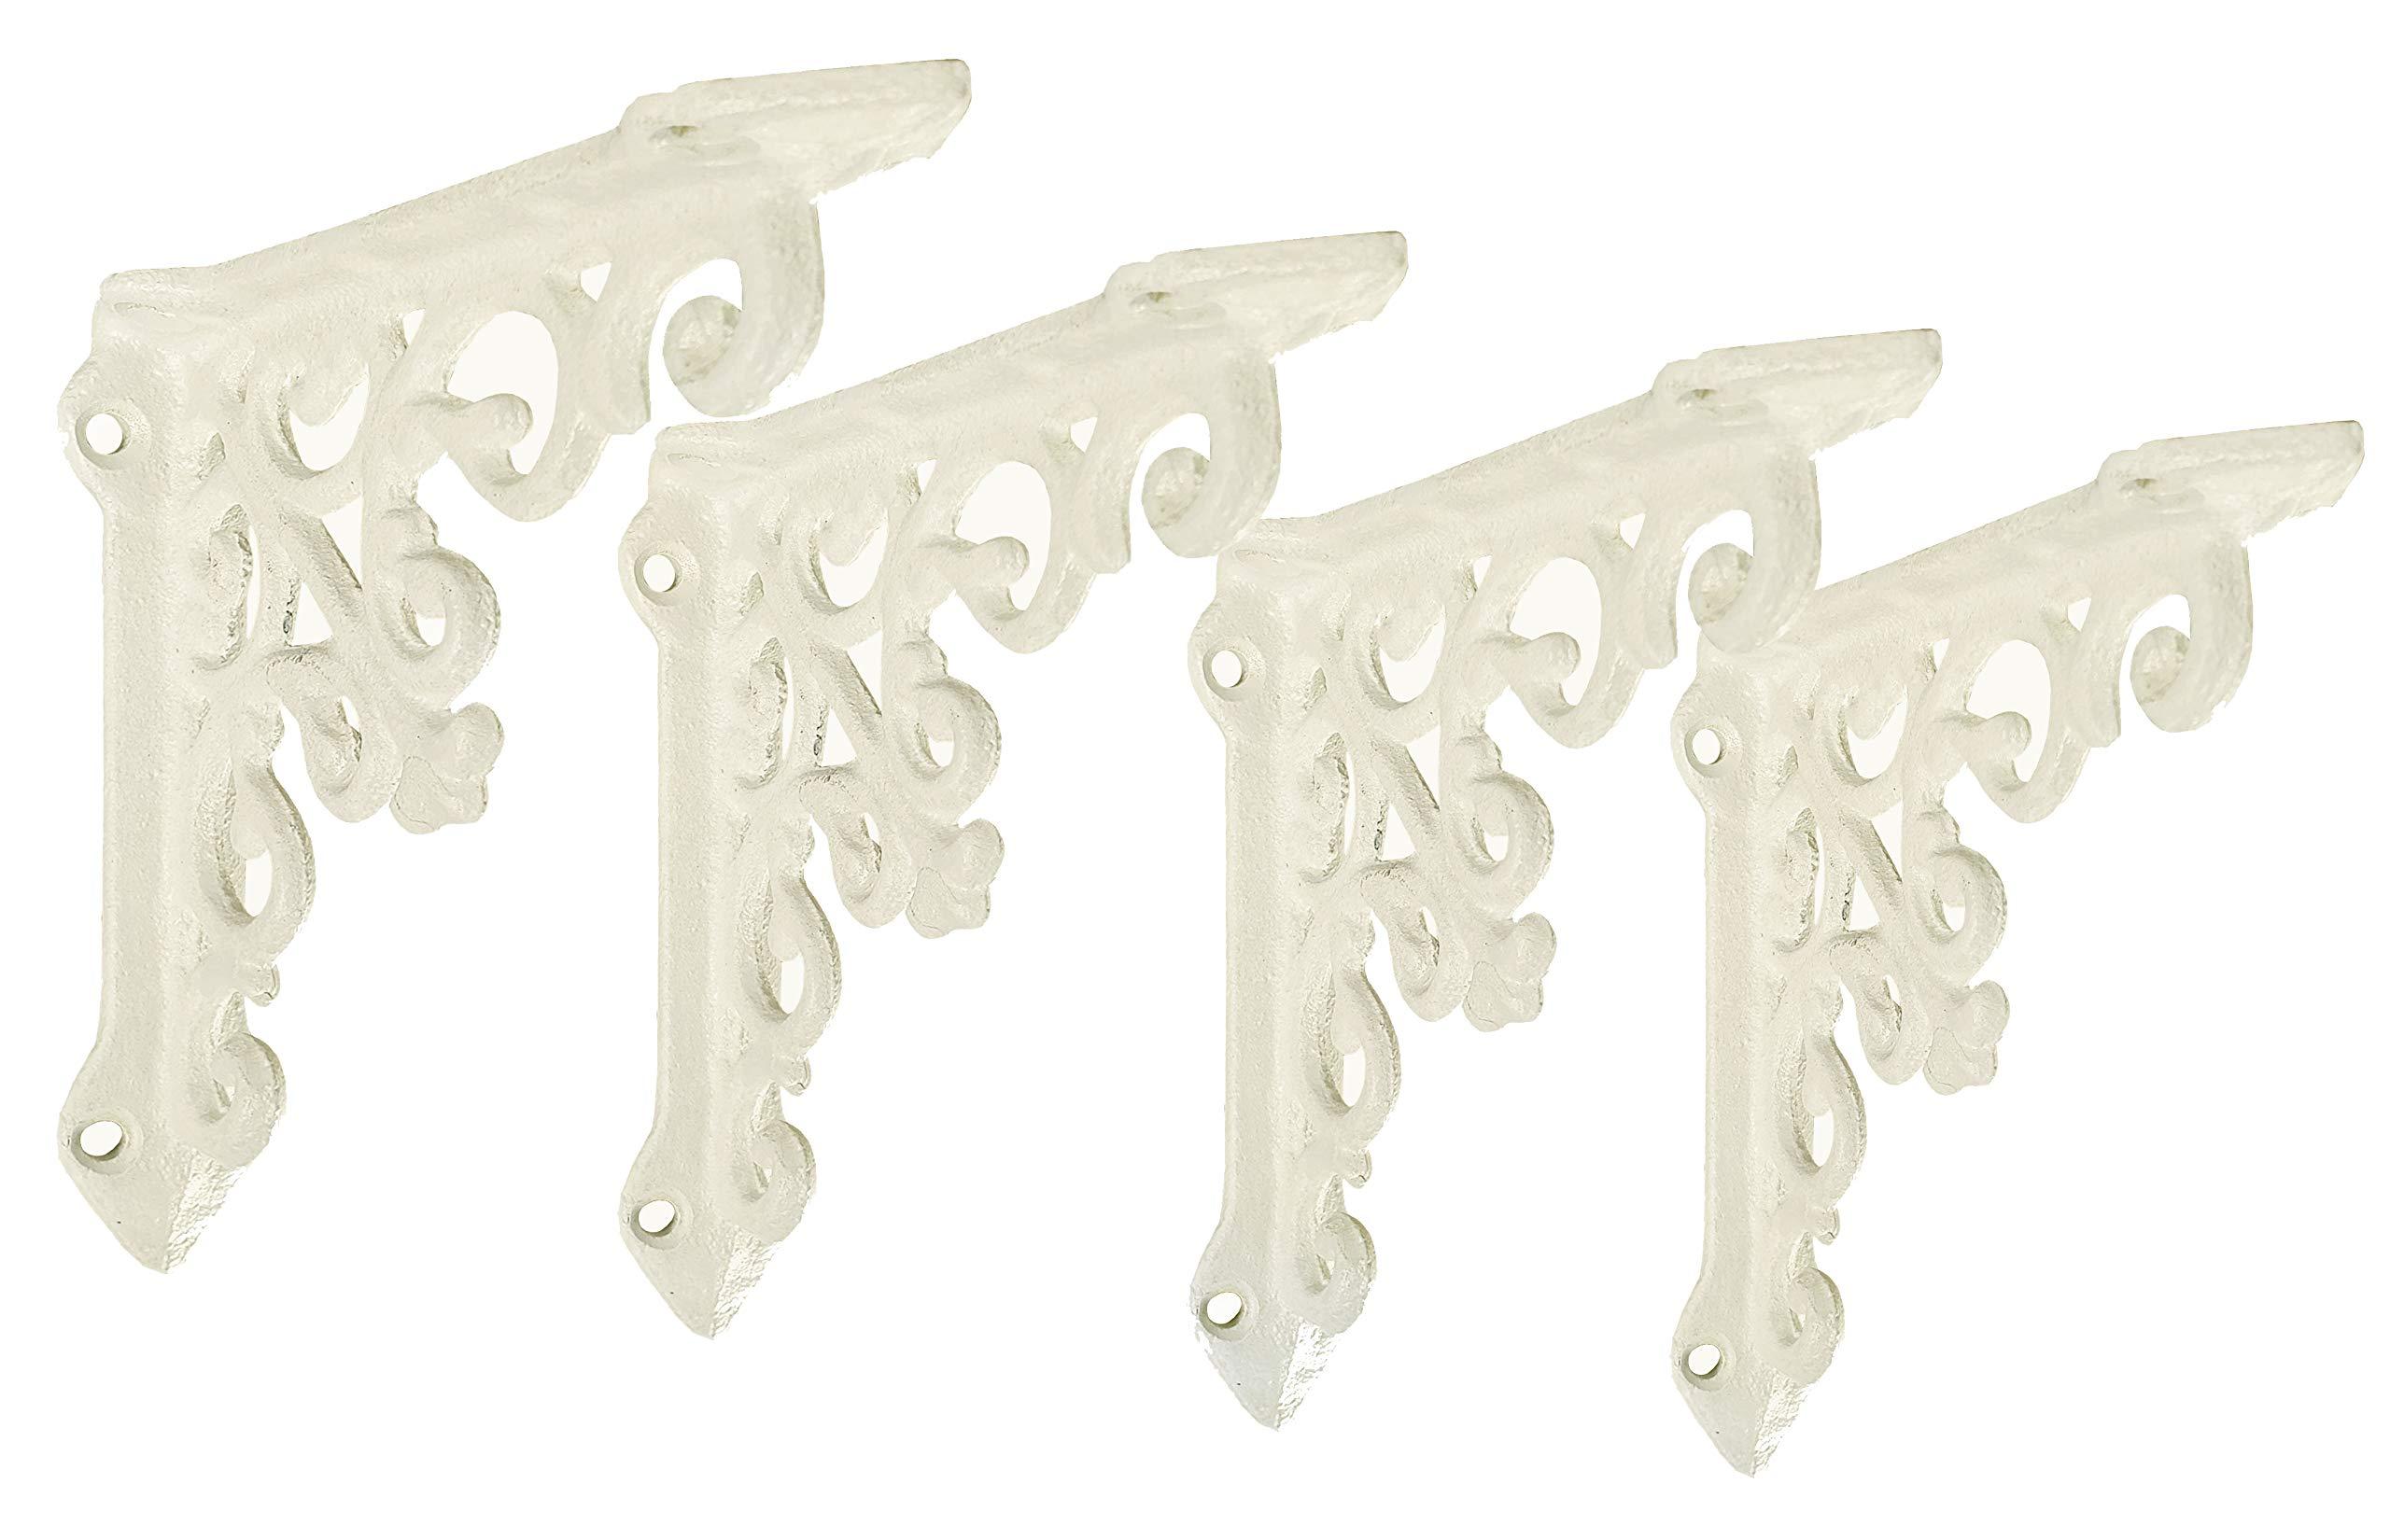 NACH js-90-061AW Cast Iron Victorian Shelf Mount Bracket, Small 4.92 x 1.18 x 4.92 Inches, White, 4 Pack by NACH